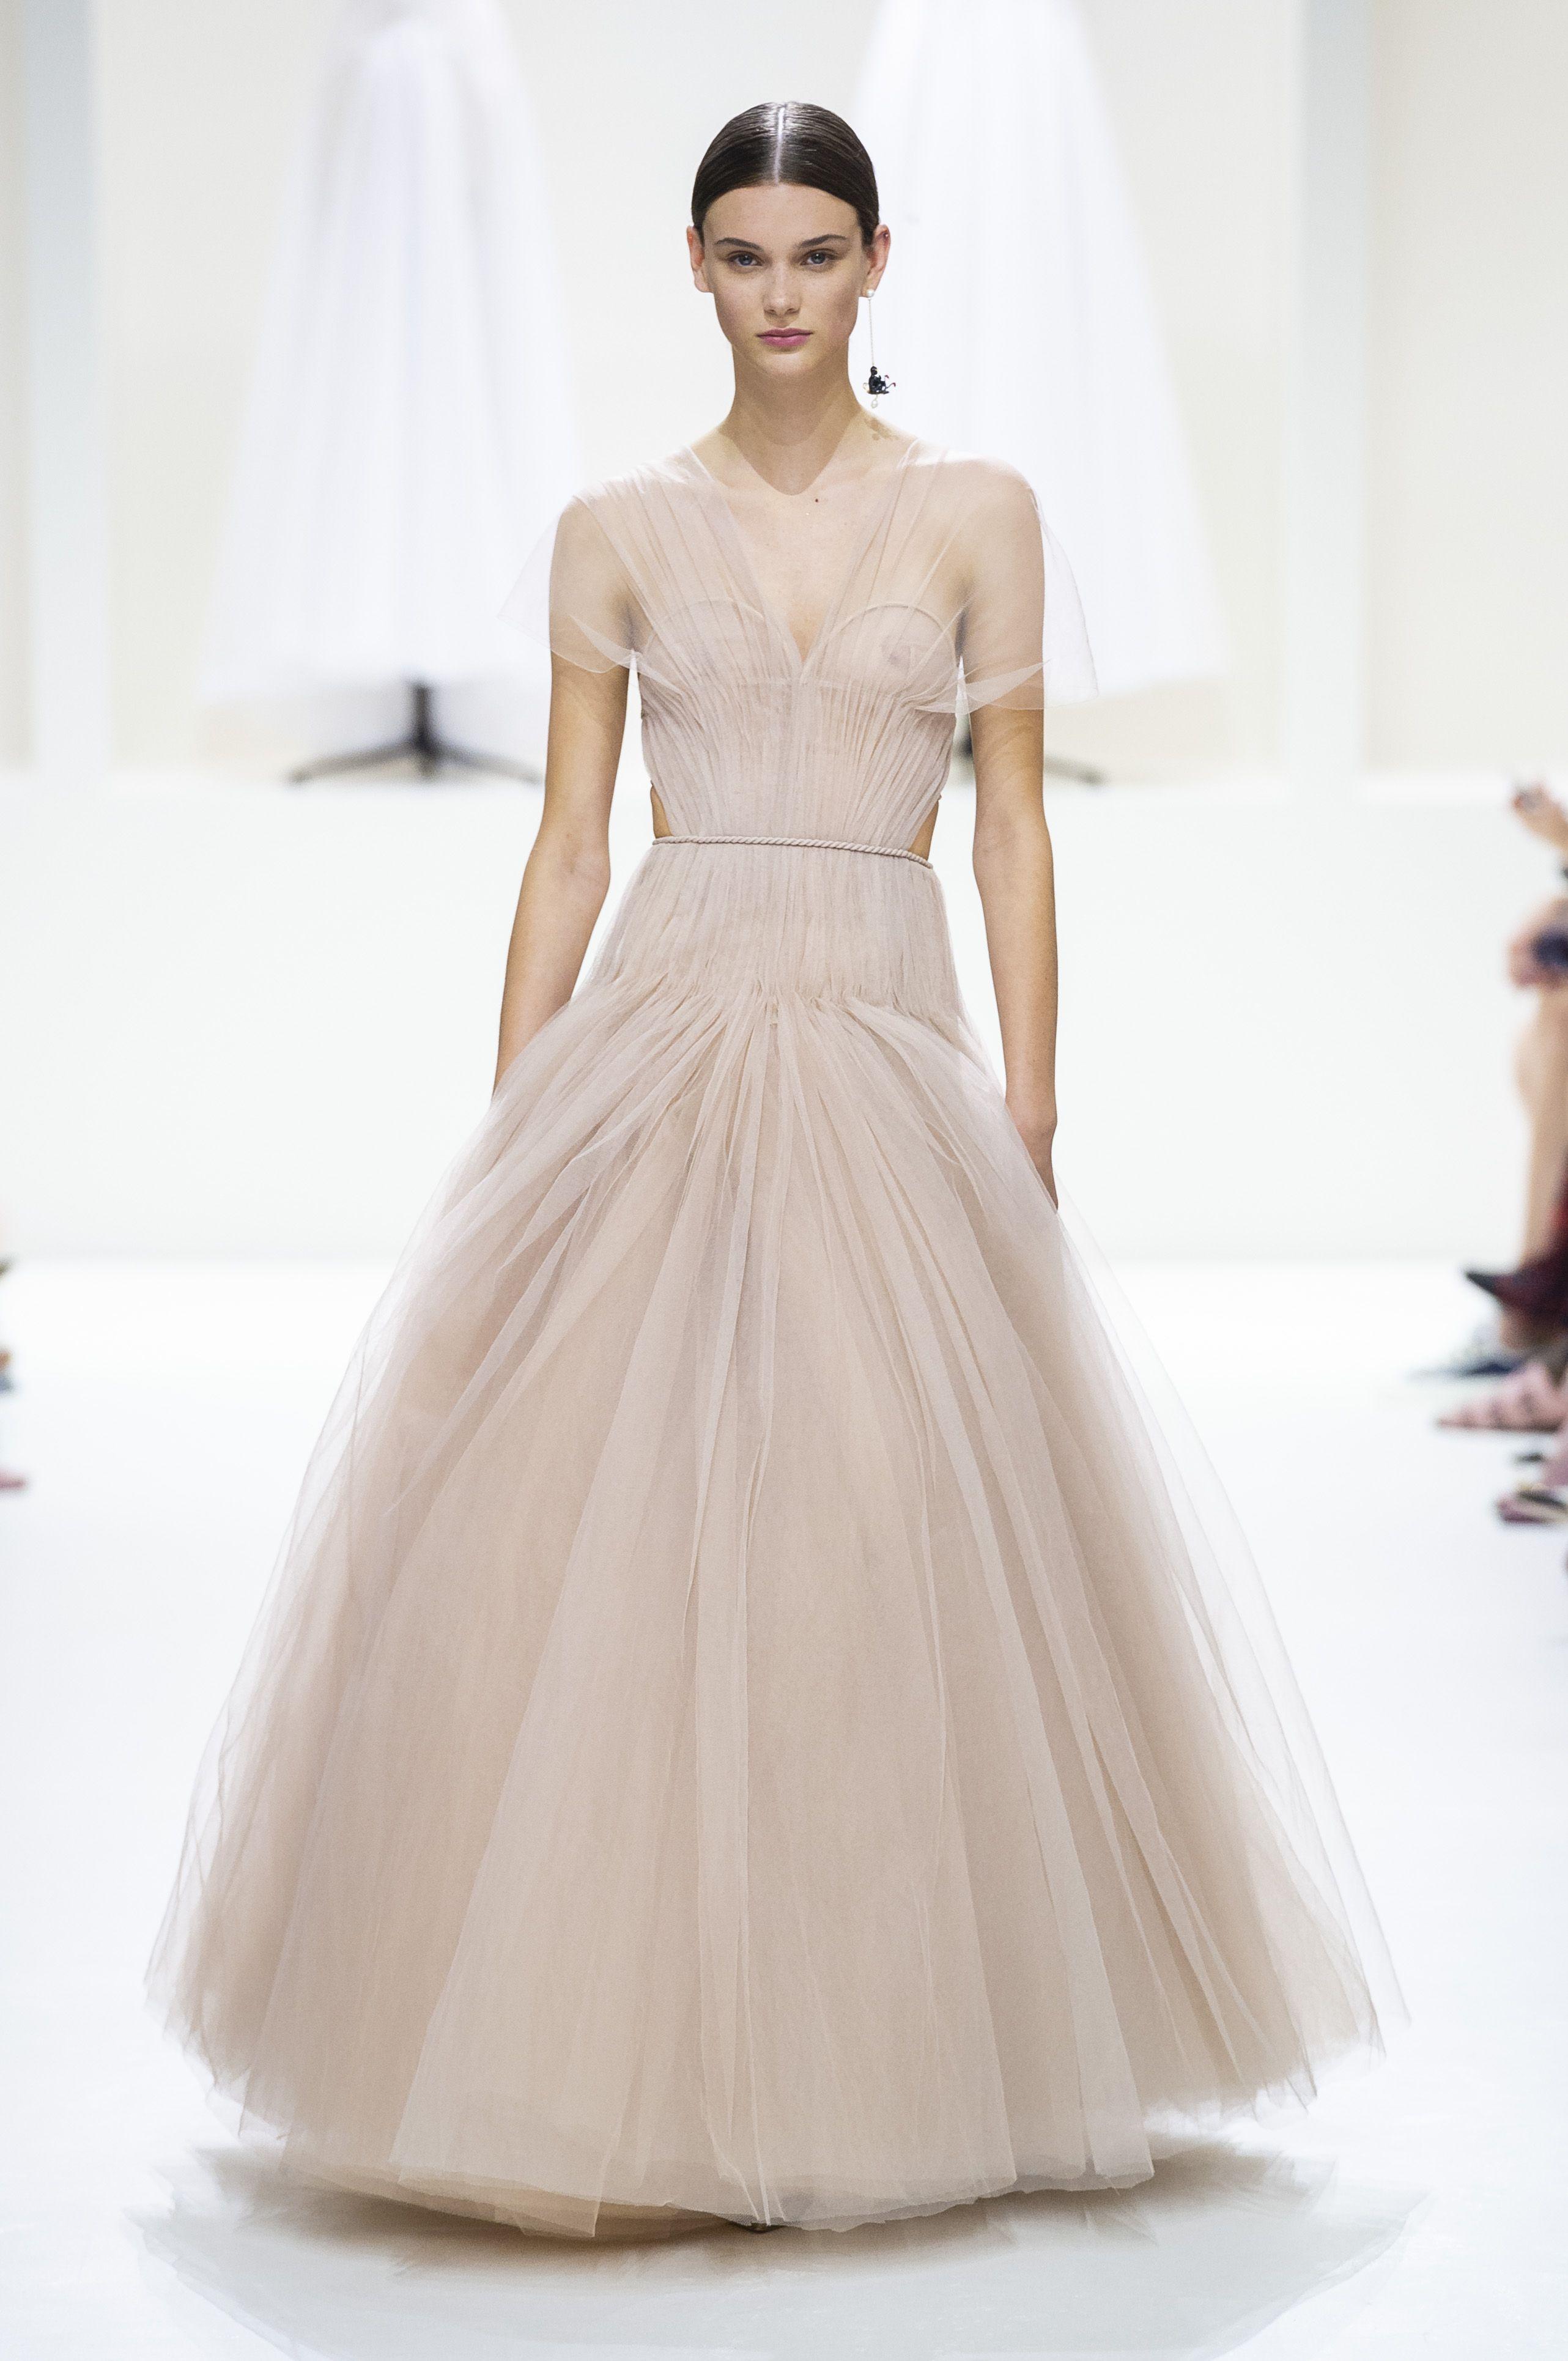 abiti da sposa 2019 tendenze